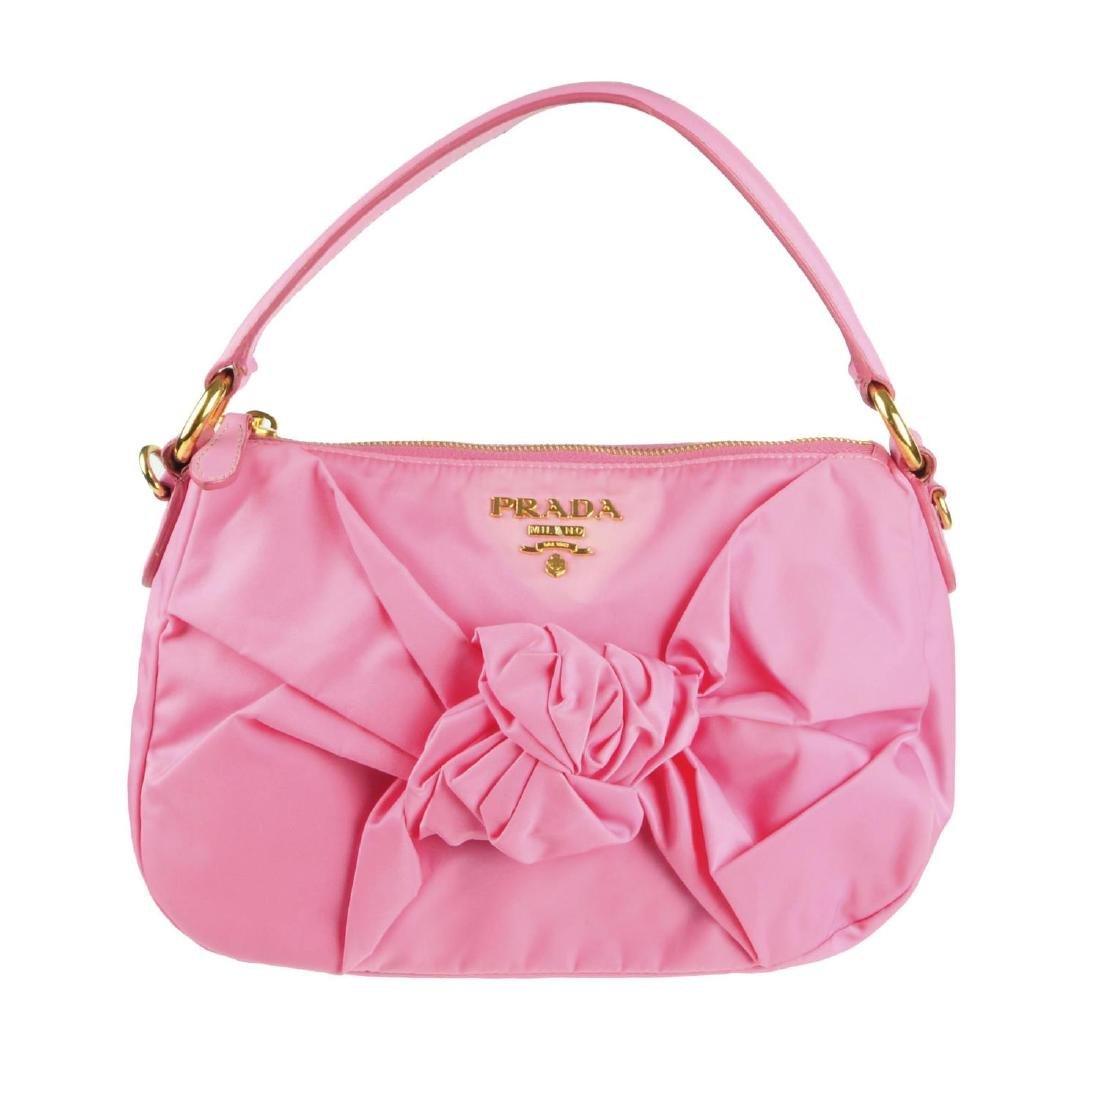 PRADA - a pink Begonia Tessuto Nylon Bow handbag.